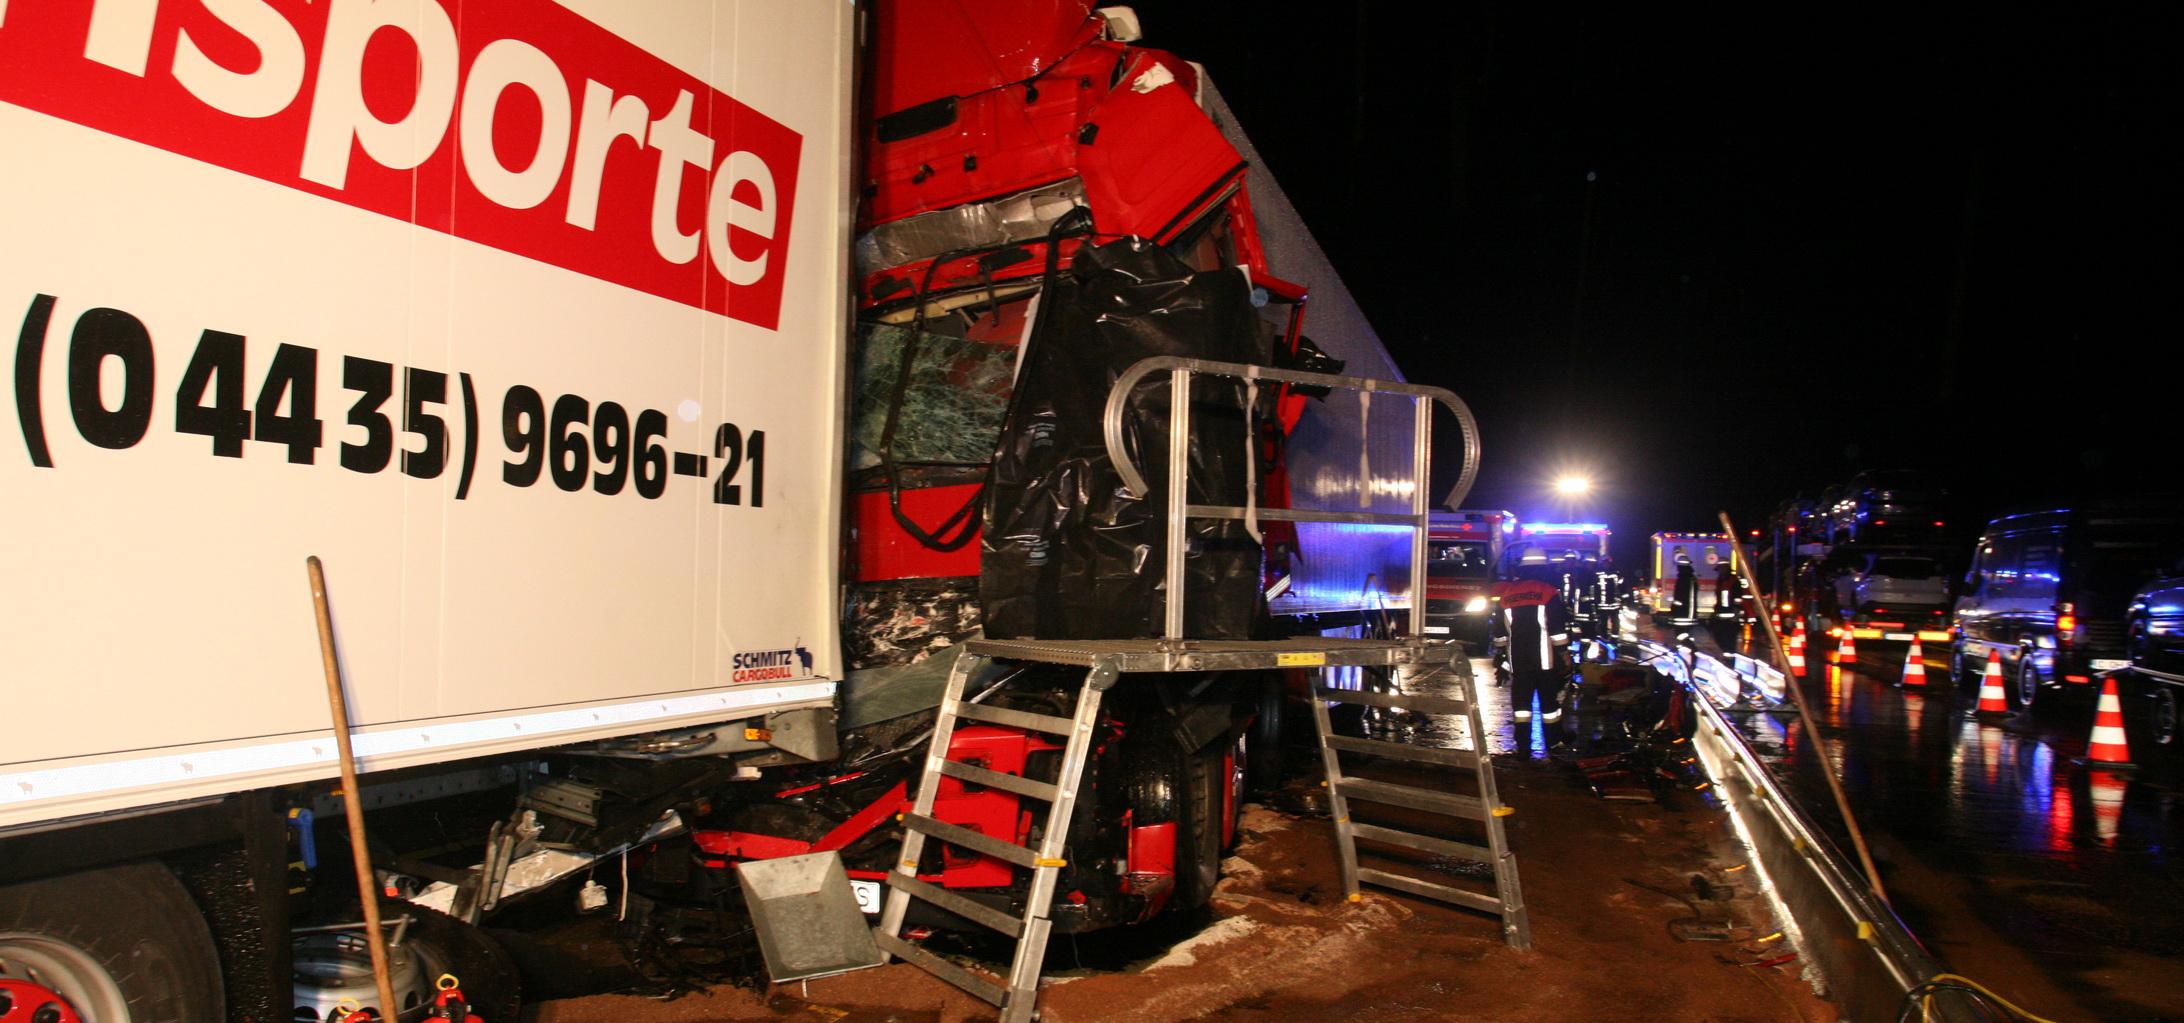 11-10-2013 bab-a8 burgau zusmarshausen lkw-Bus toter unfall zwiebler new-facts-eu20131011 titel